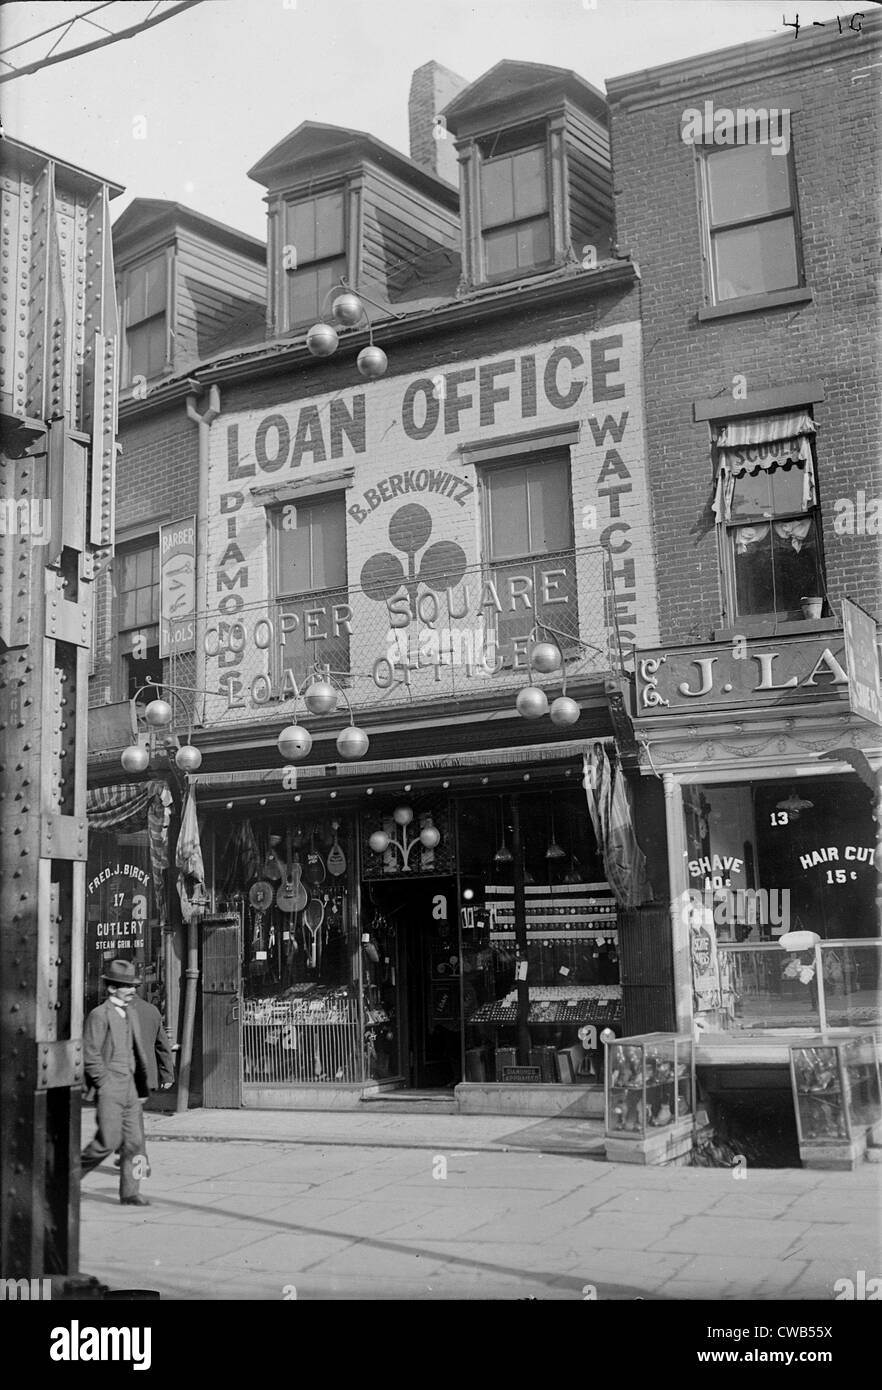 Pawn shop, photograph, 1900s-1930s. - Stock Image